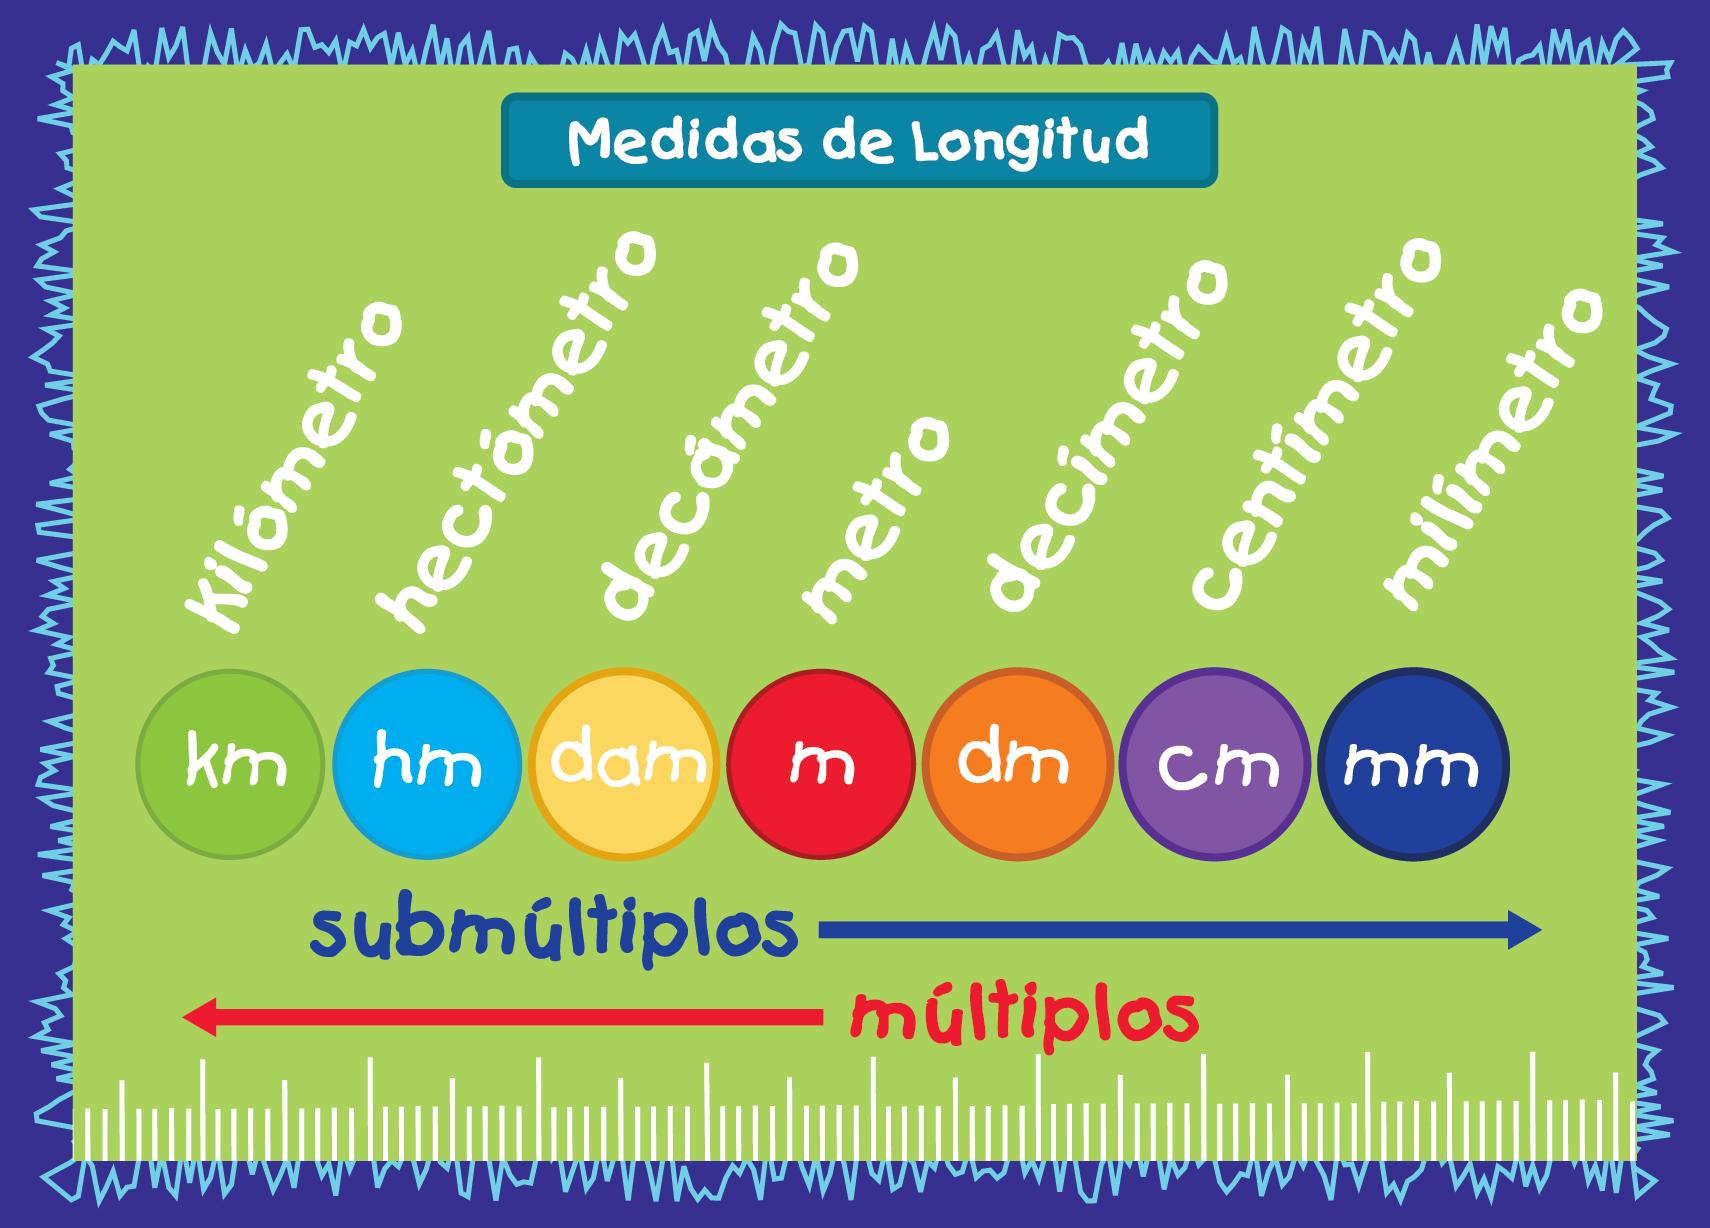 Póster Académico Matemáticas Pam 004 Medidas De Longitud Matematicas Fichas De Matematicas Actividades De Quinto Grado